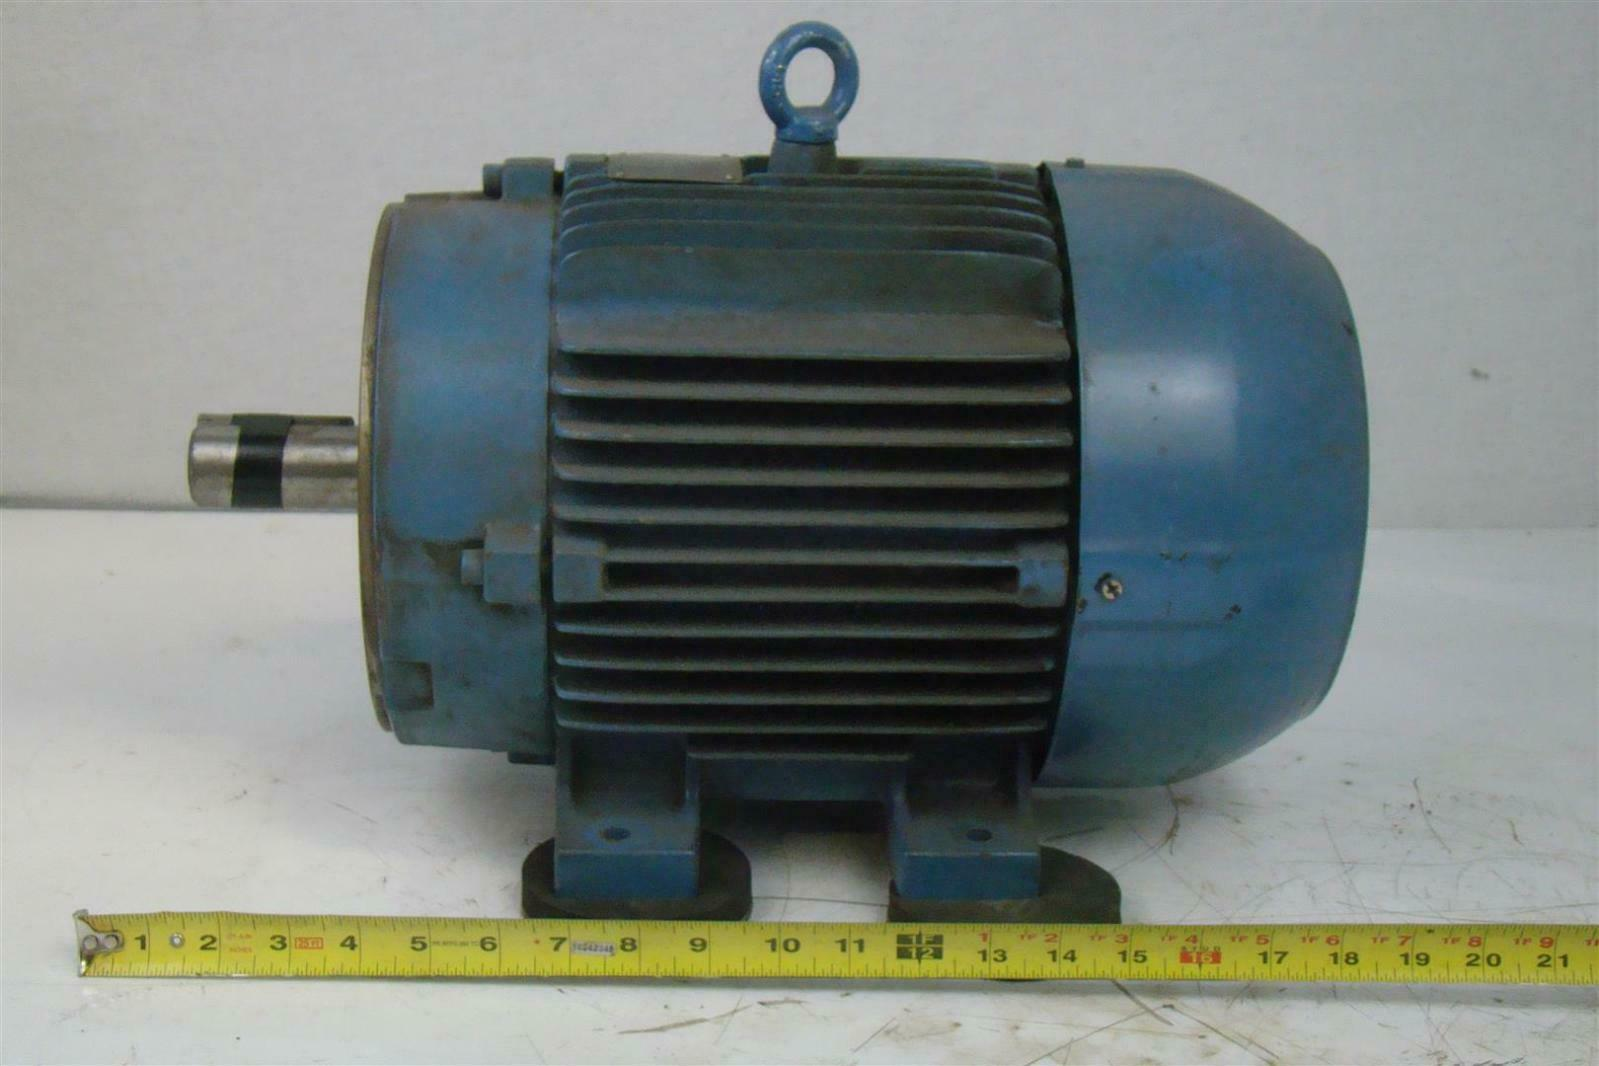 Weg motor 7-1/2HP W21 ph3 380/460V 2885/3515rpm w .375 ...